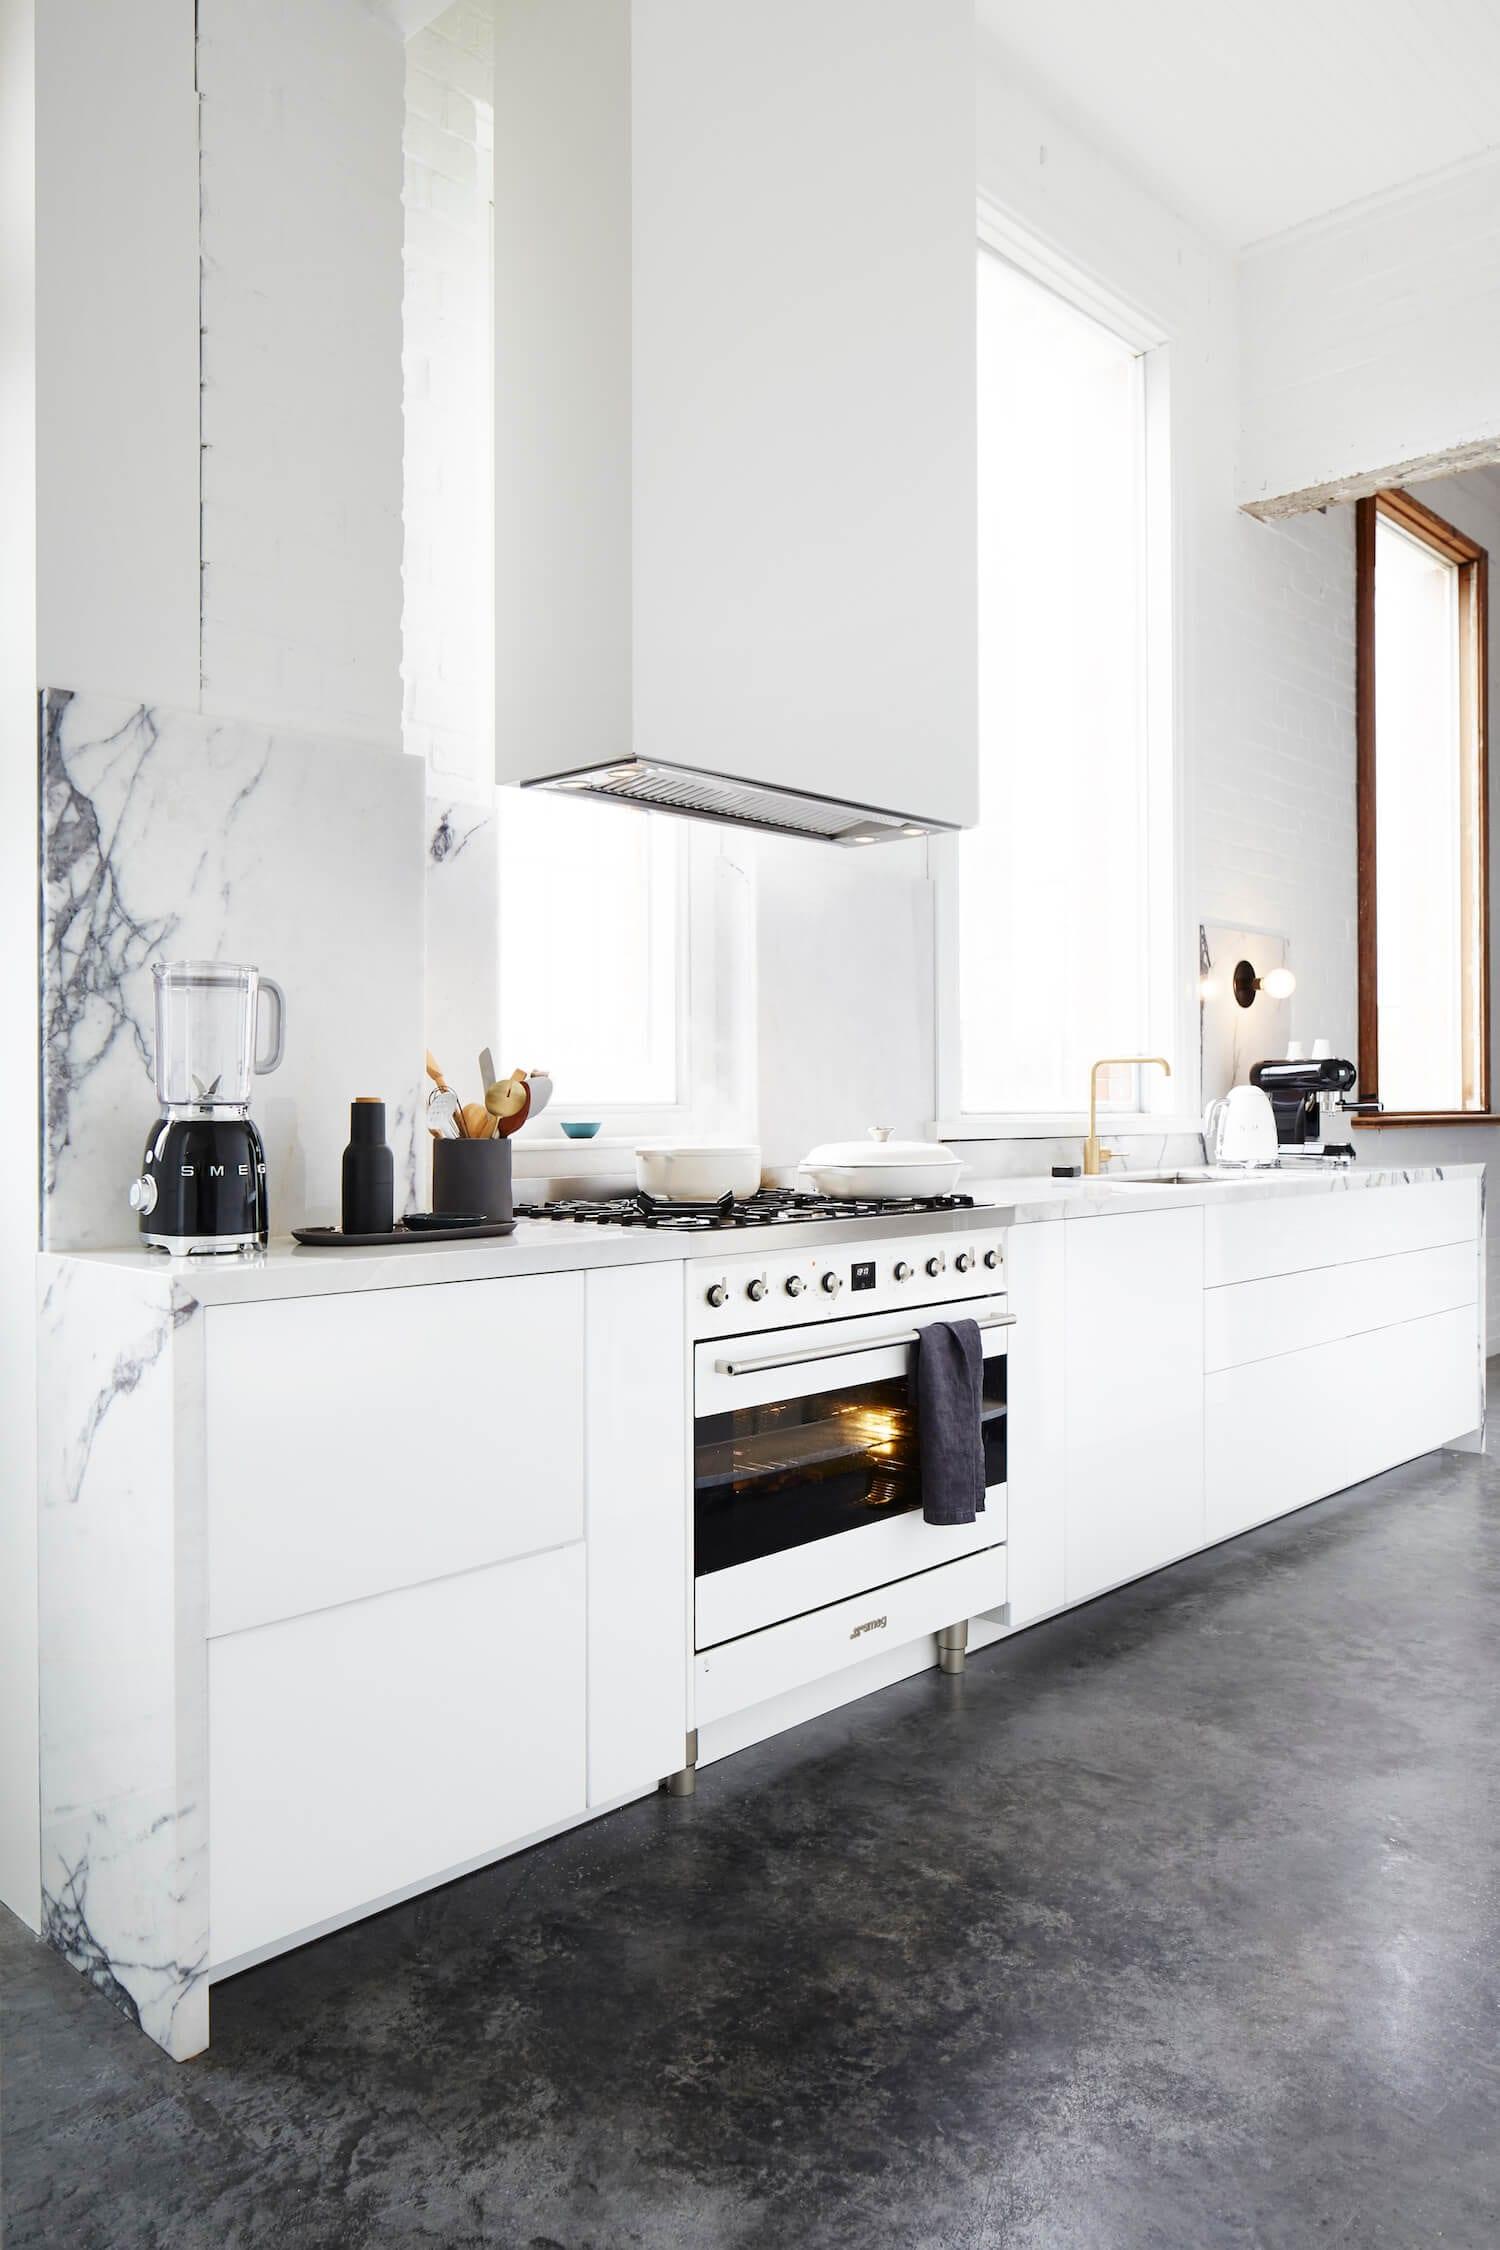 Smeg Freestanding Cooker in Armelle Habib's Studio Kitchen | Yellowtrace